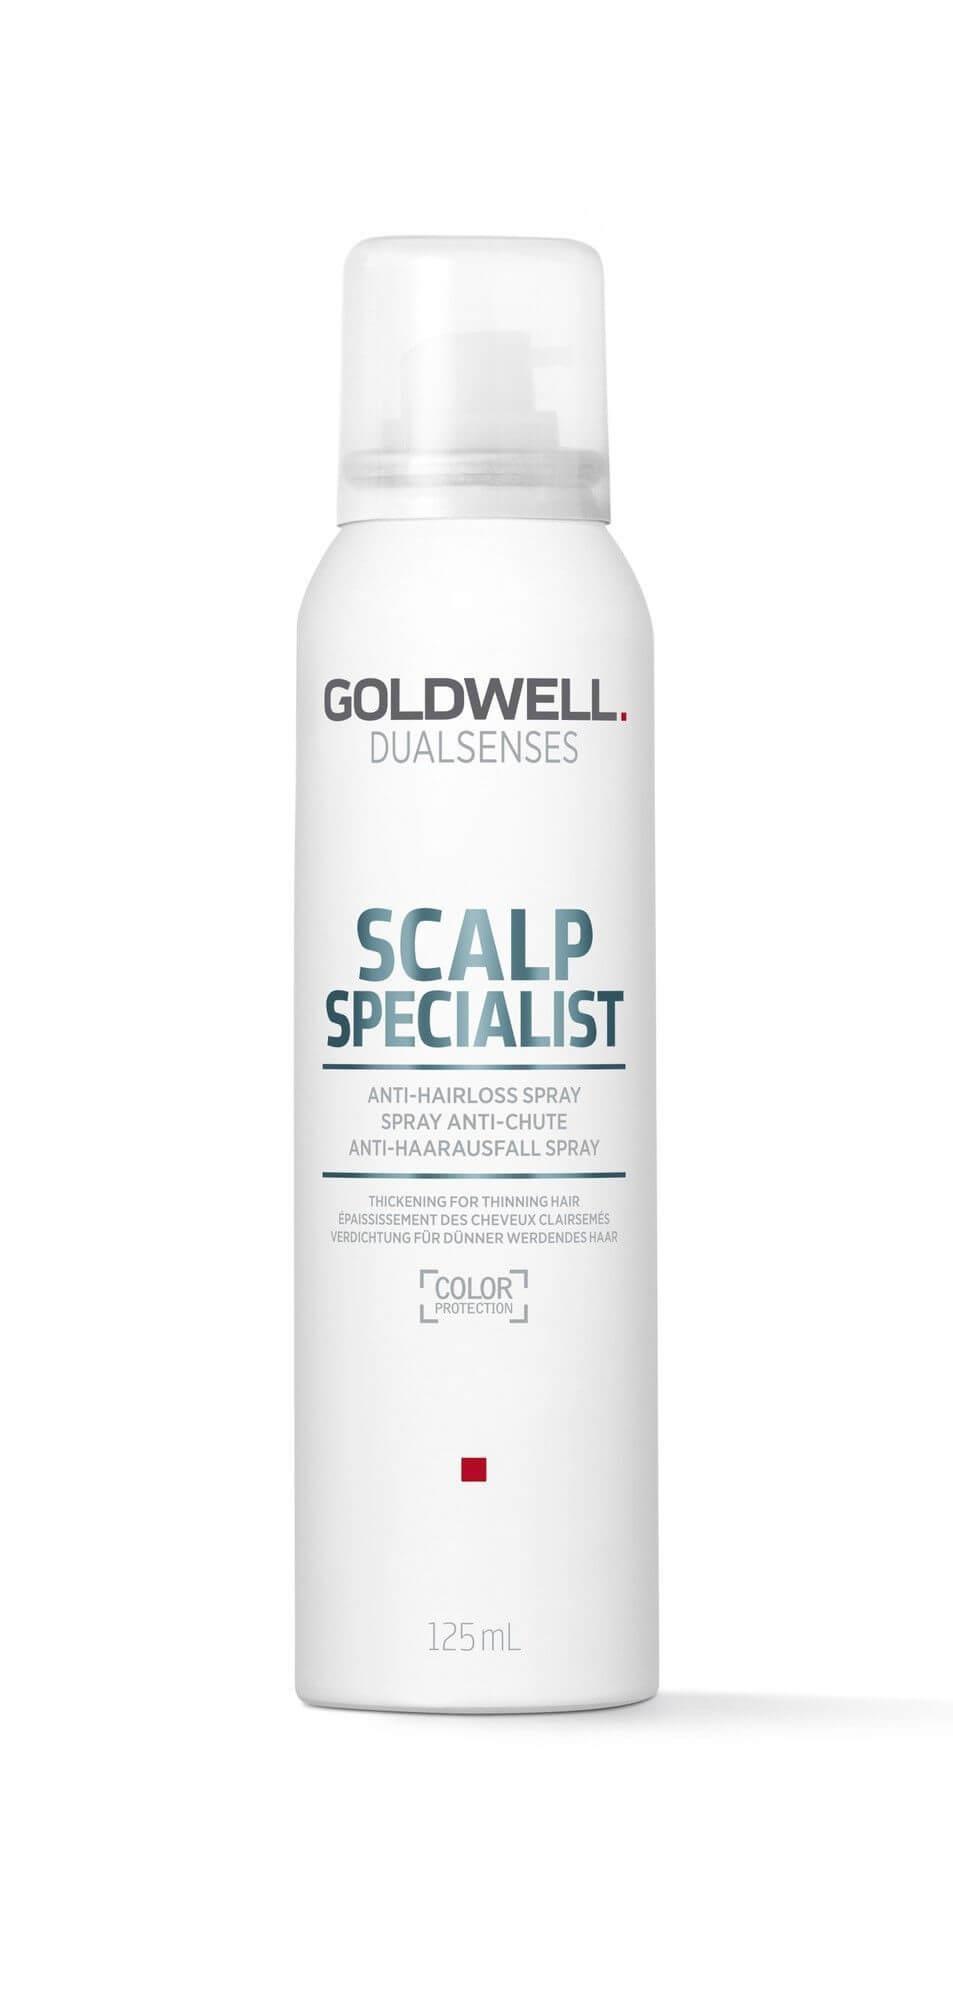 Dualsenses Scalp Specialist Anti-Hairloss Spray.